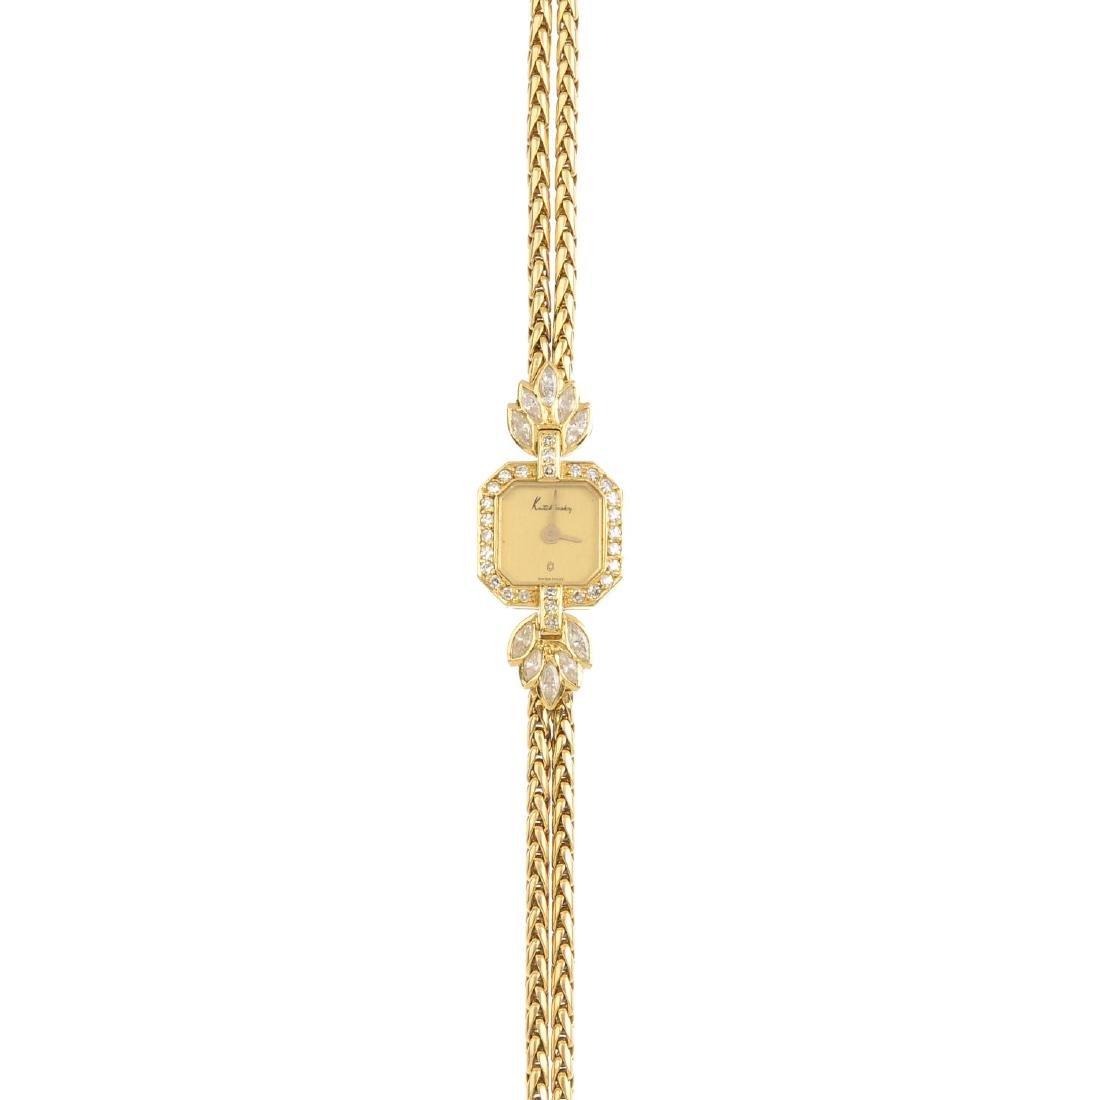 KUTCHINSKY - a lady's diamond cocktail watch. The